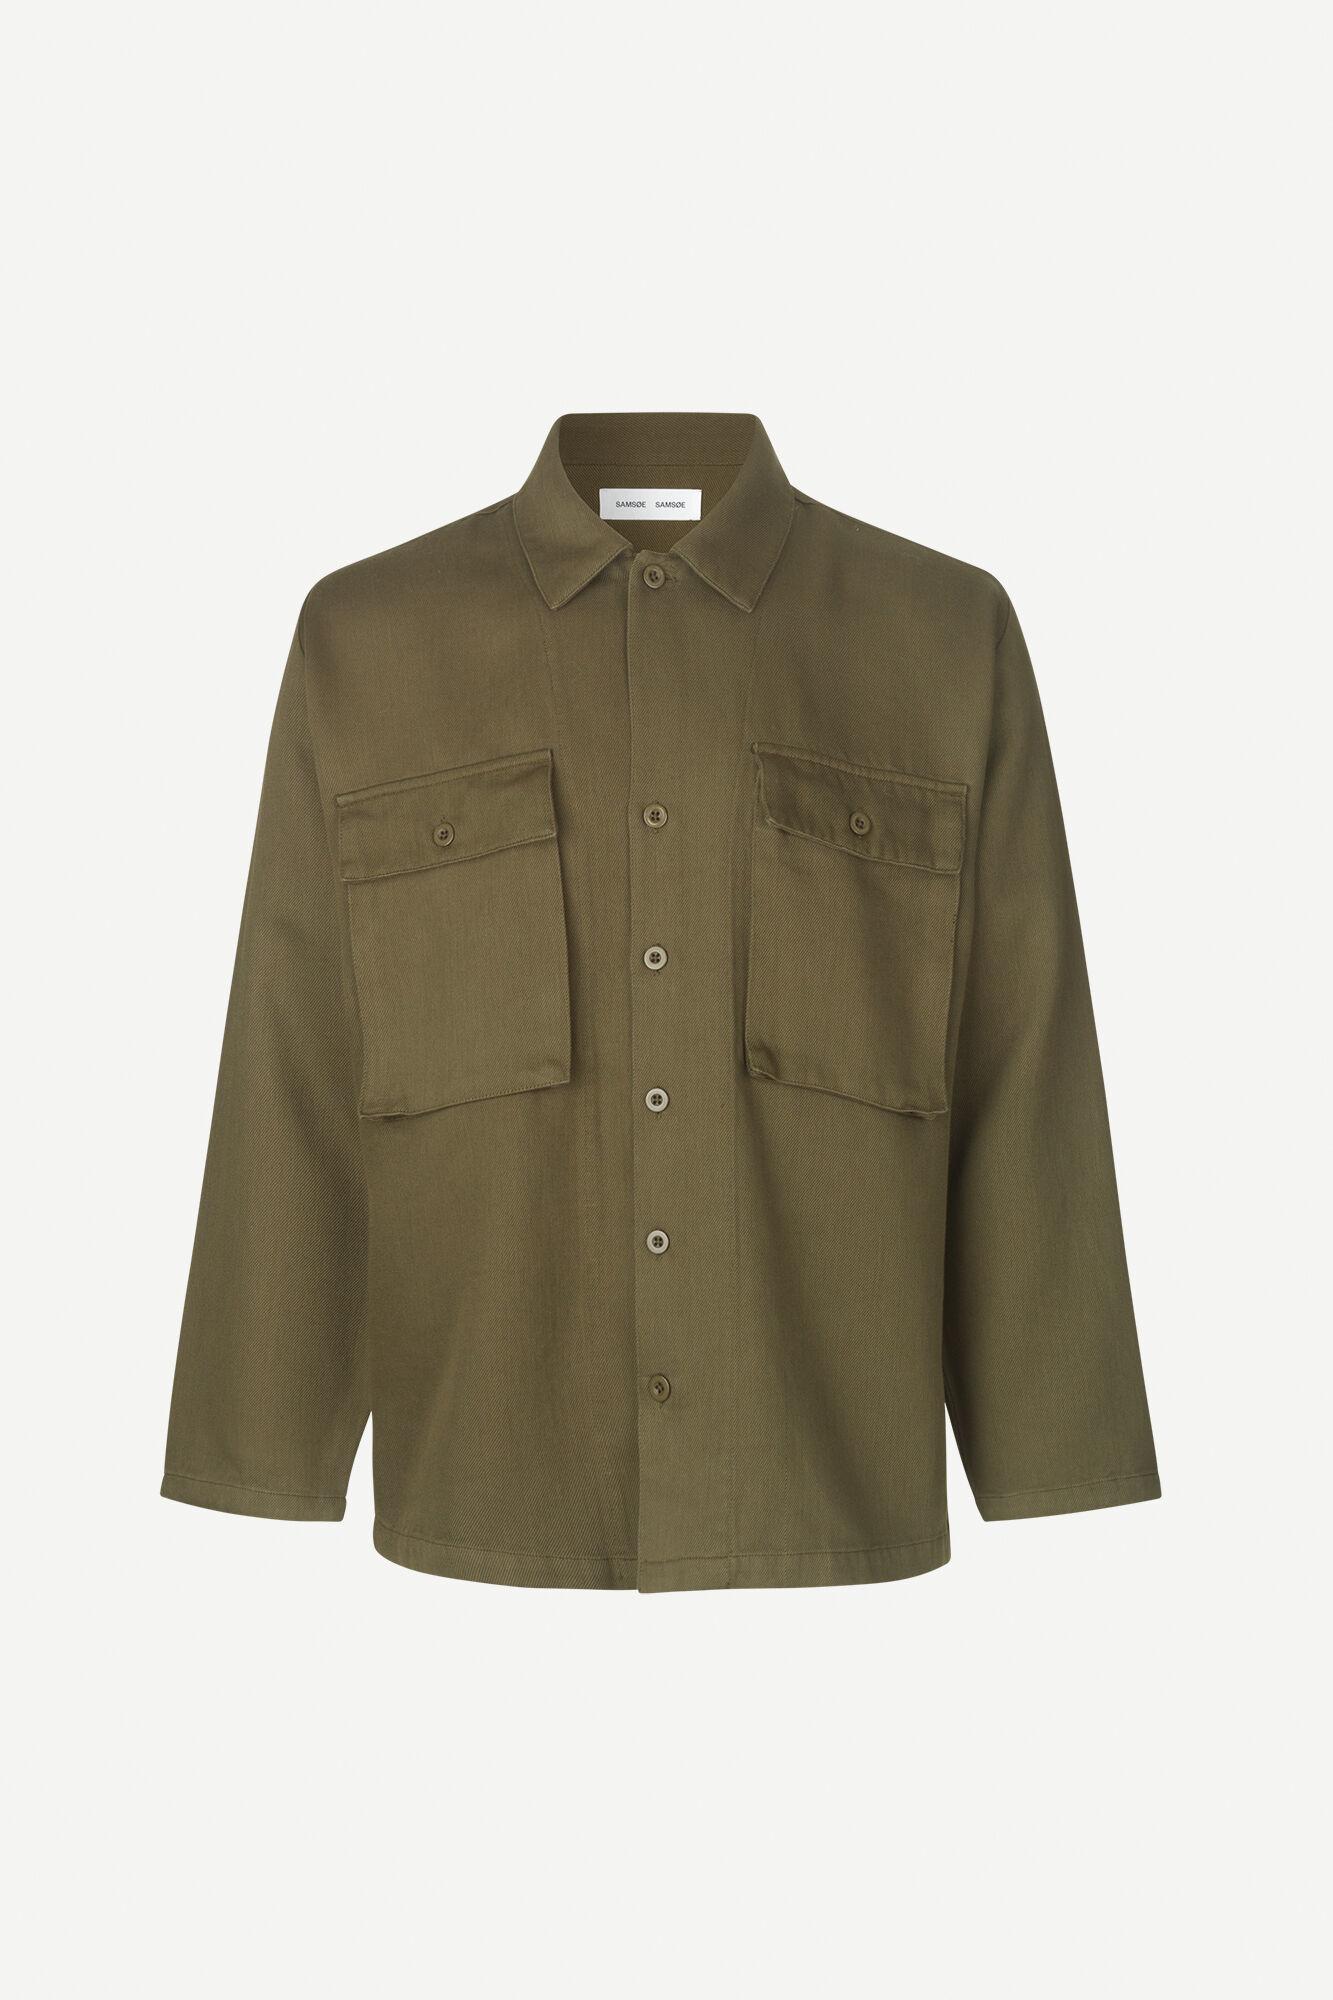 Vega Dark Olive Overshirt 12804-1